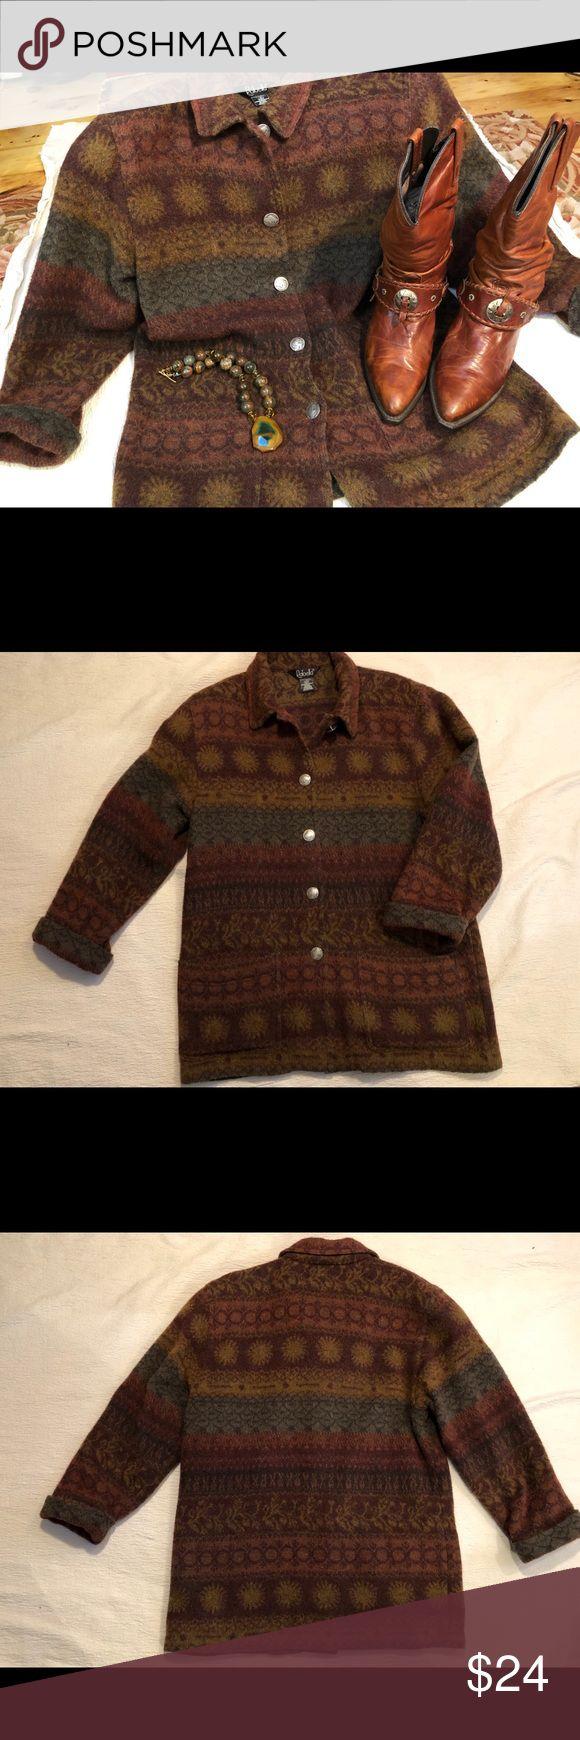 Rafaella jacket blanket style sz. Medium Blanket style jacket 50% wool. Warm brown , rust , gold . Unusual buffalo nickel style buttons !  Warm , cozy , and stylish! Size medium . Rafaella Jackets & Coats Blazers